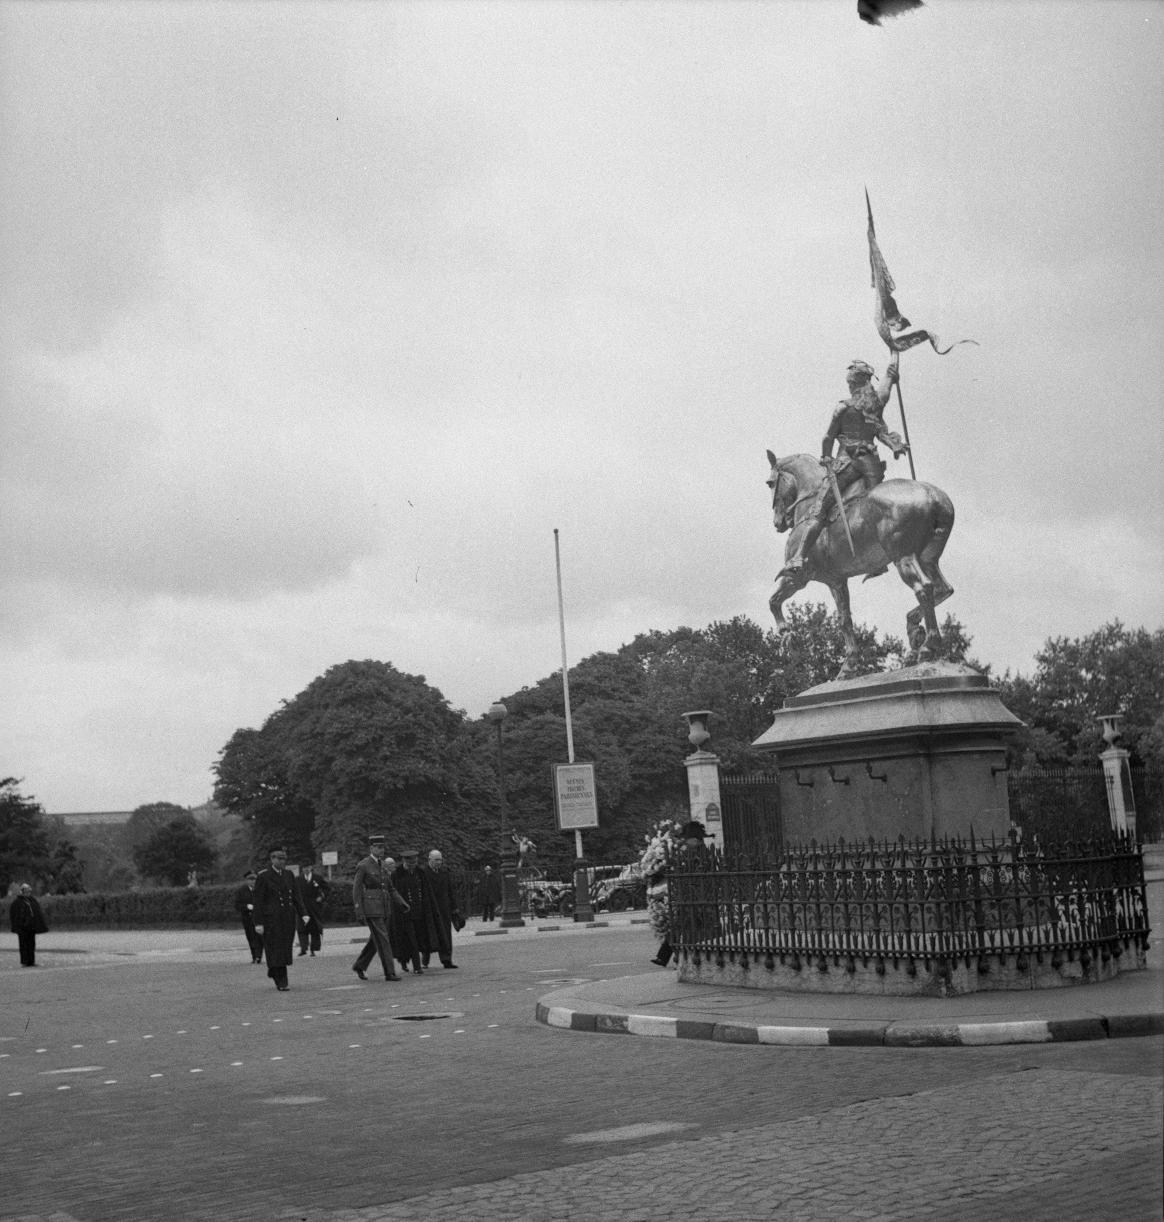 006. Перед монументом Жанны д'Арк, Площадь Пирамид